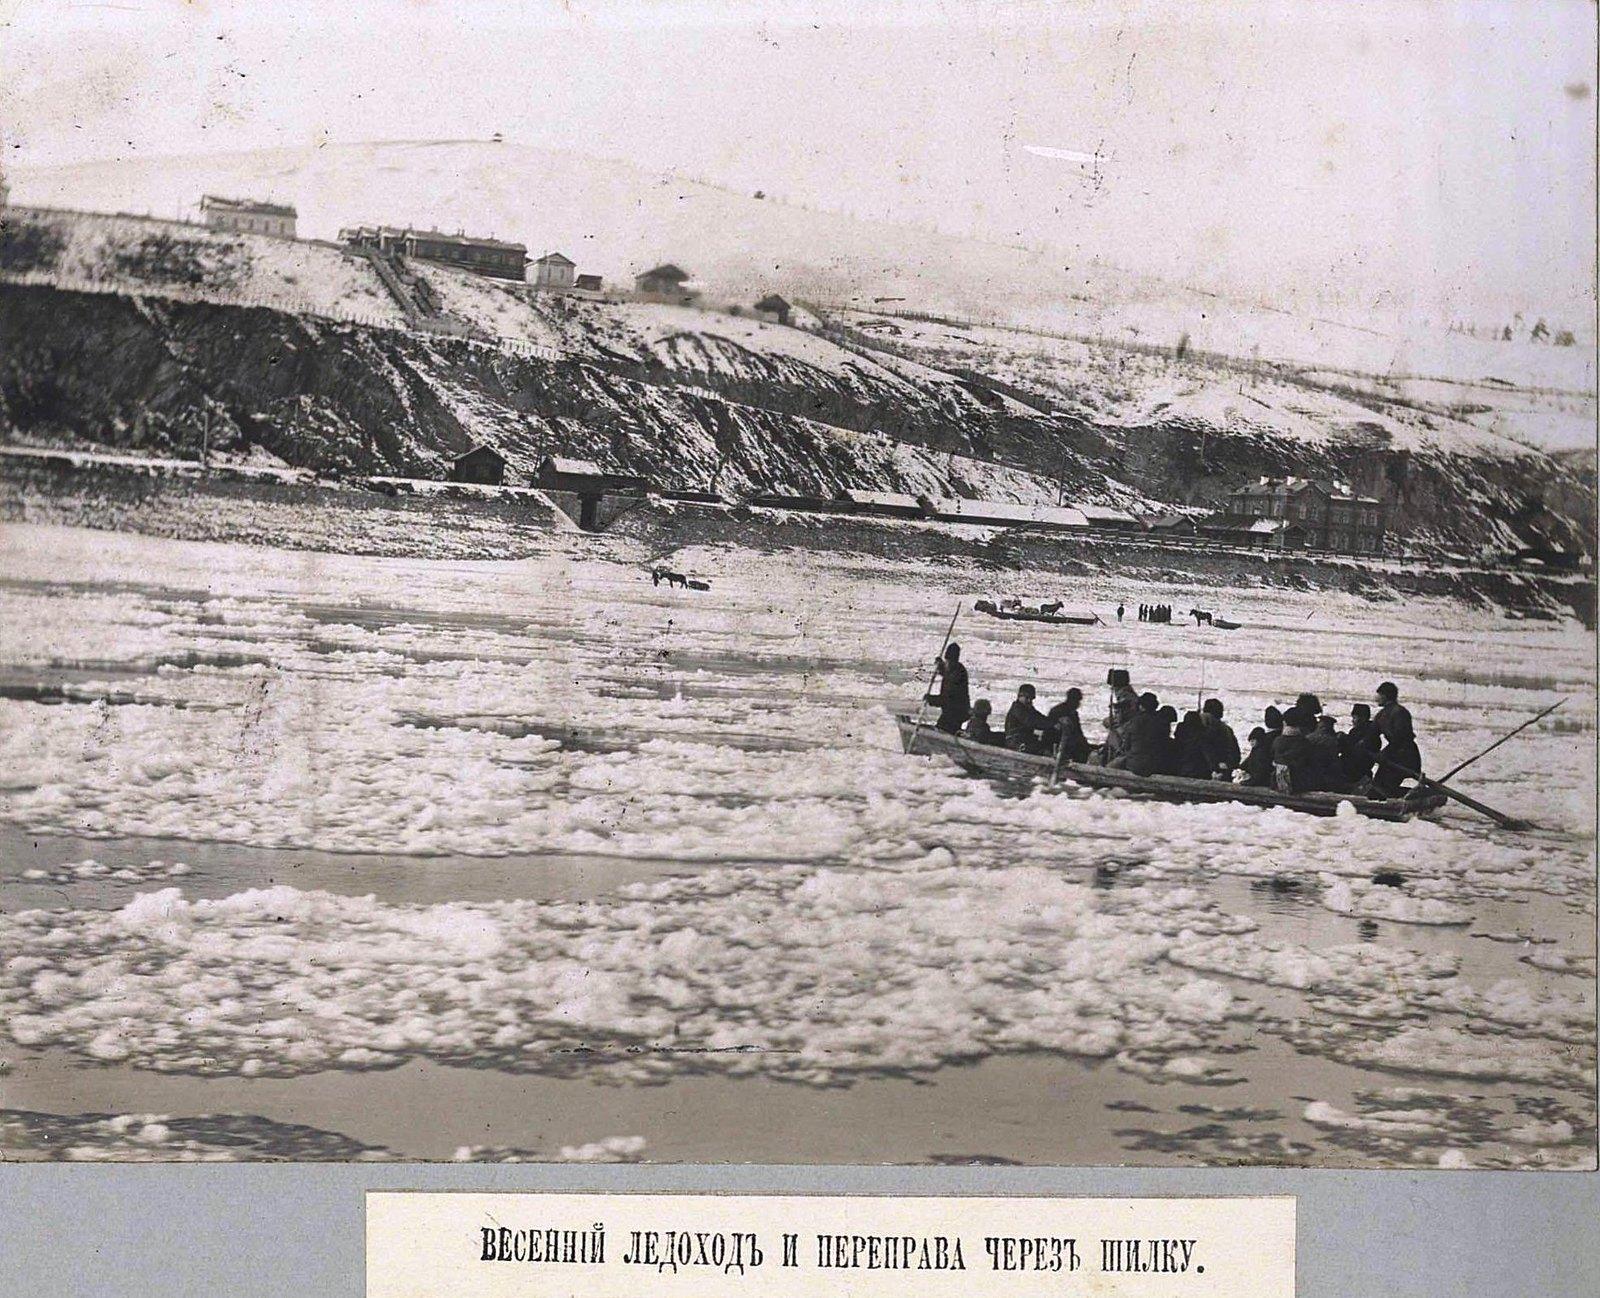 24. Весенний ледоход и переправа через Шилку